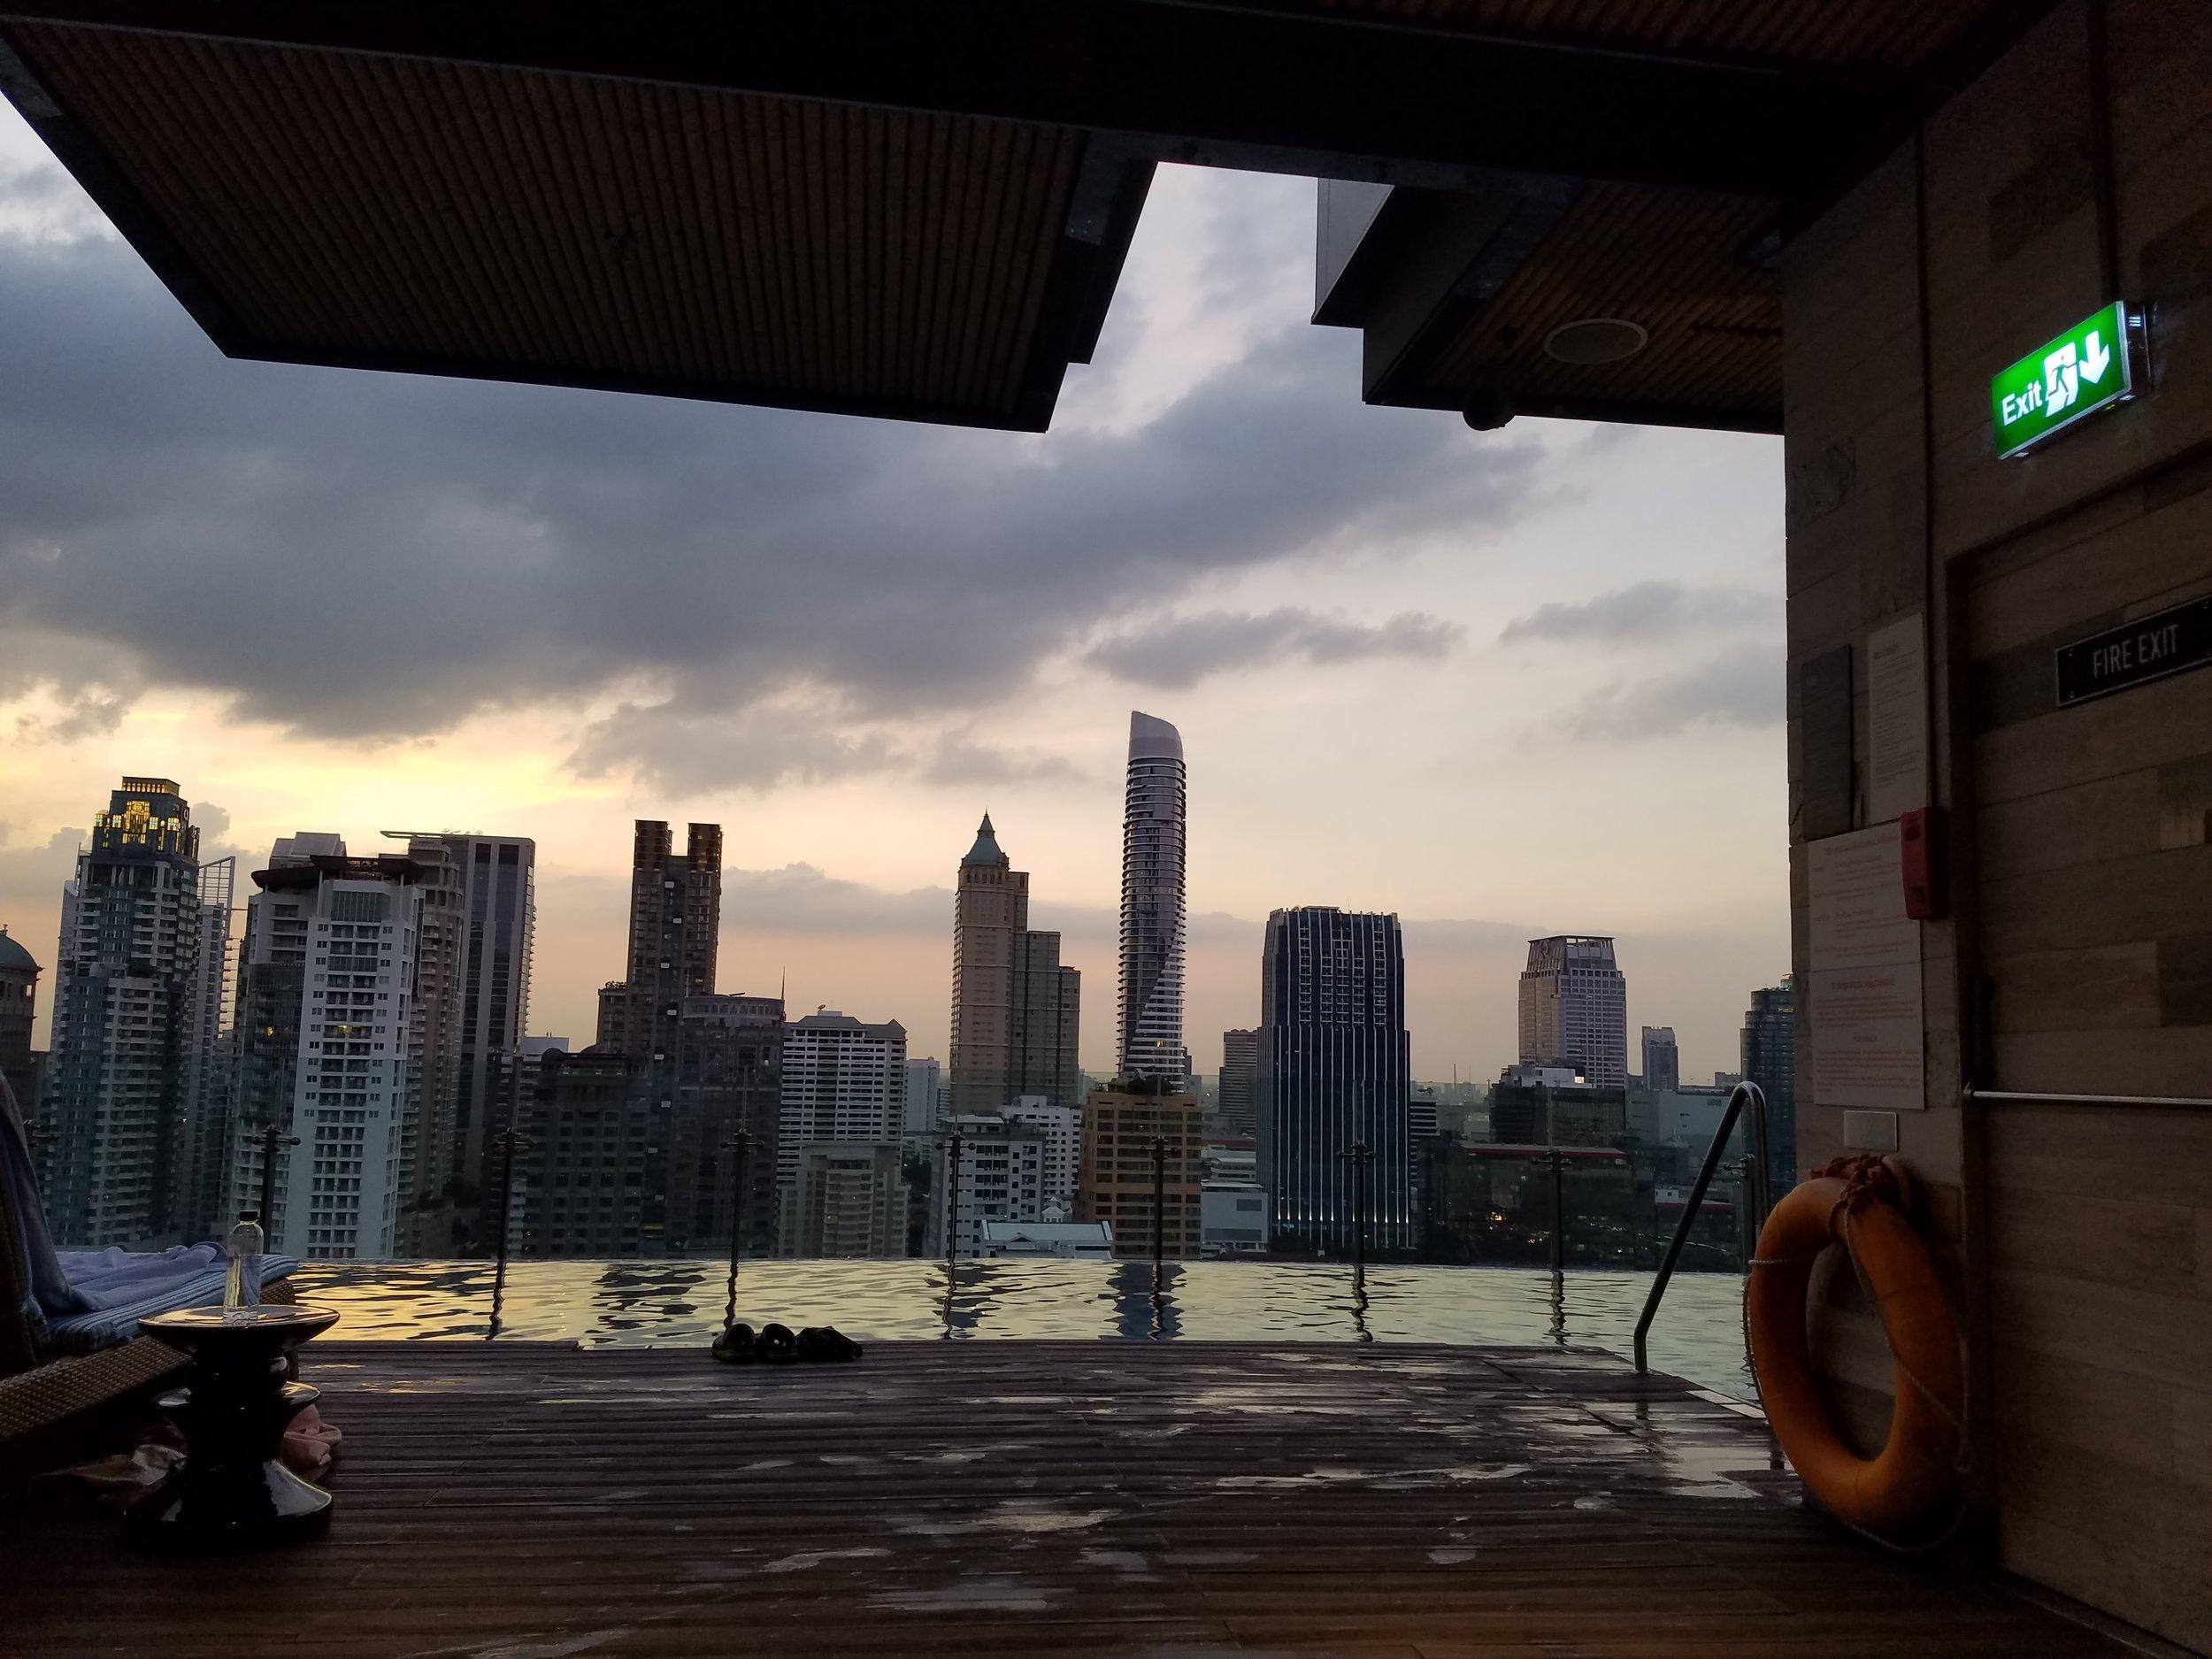 bangkok rooftop views.jpg